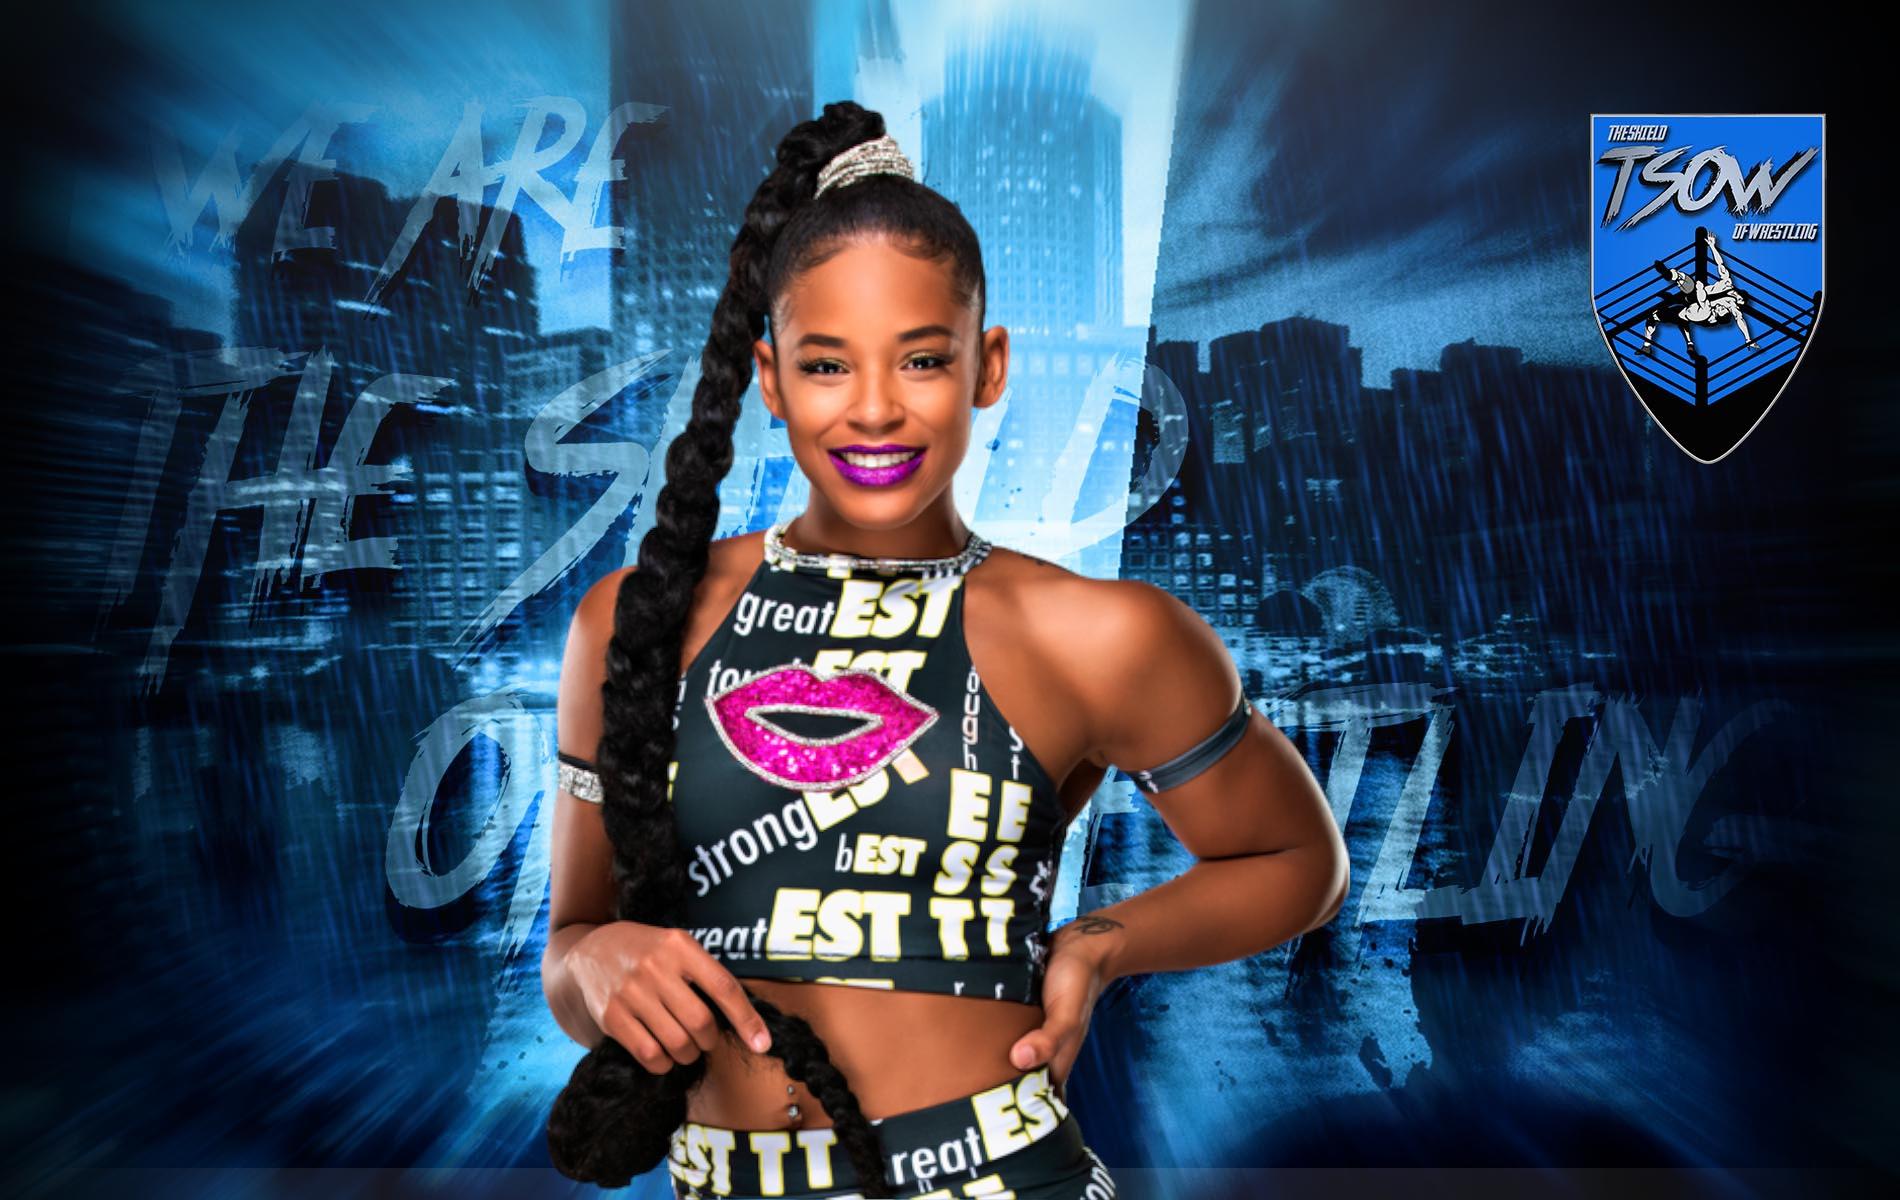 Bianca Belair parla del momento con Naomi alla Royal Rumble